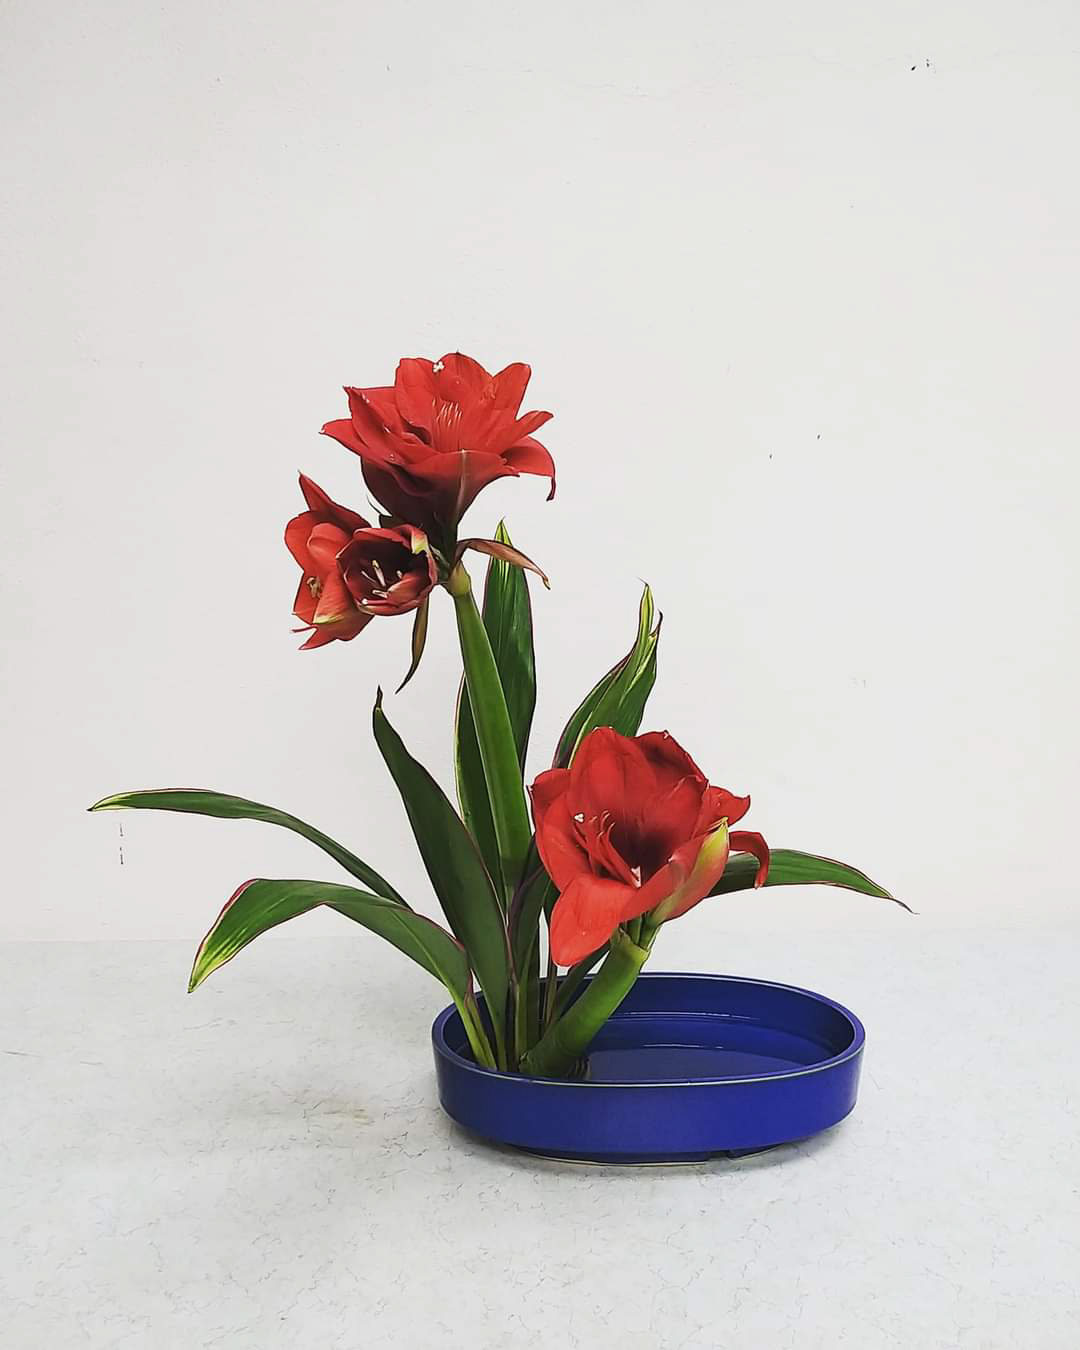 ohara-florist-japanese-ikebana-arrangement-course-6